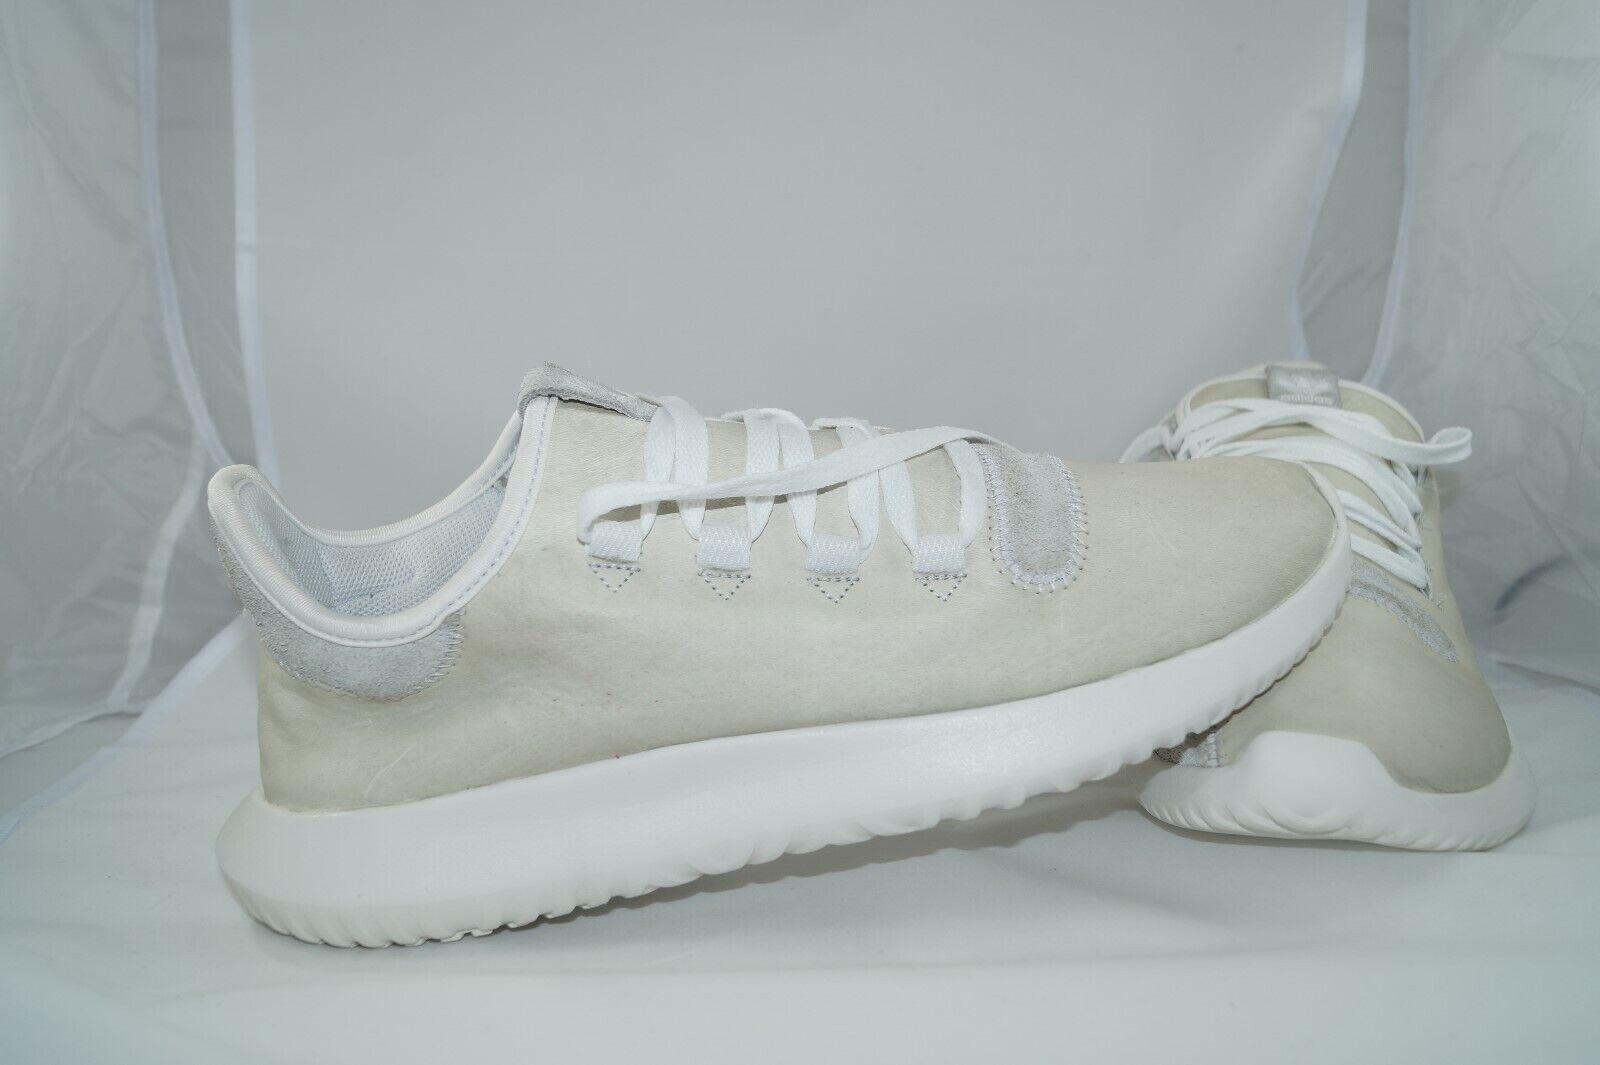 Adidas Tubular Shadow EU 46 - 45,5 US 11,5 Laufschuhe BB8821 Sportschuhe